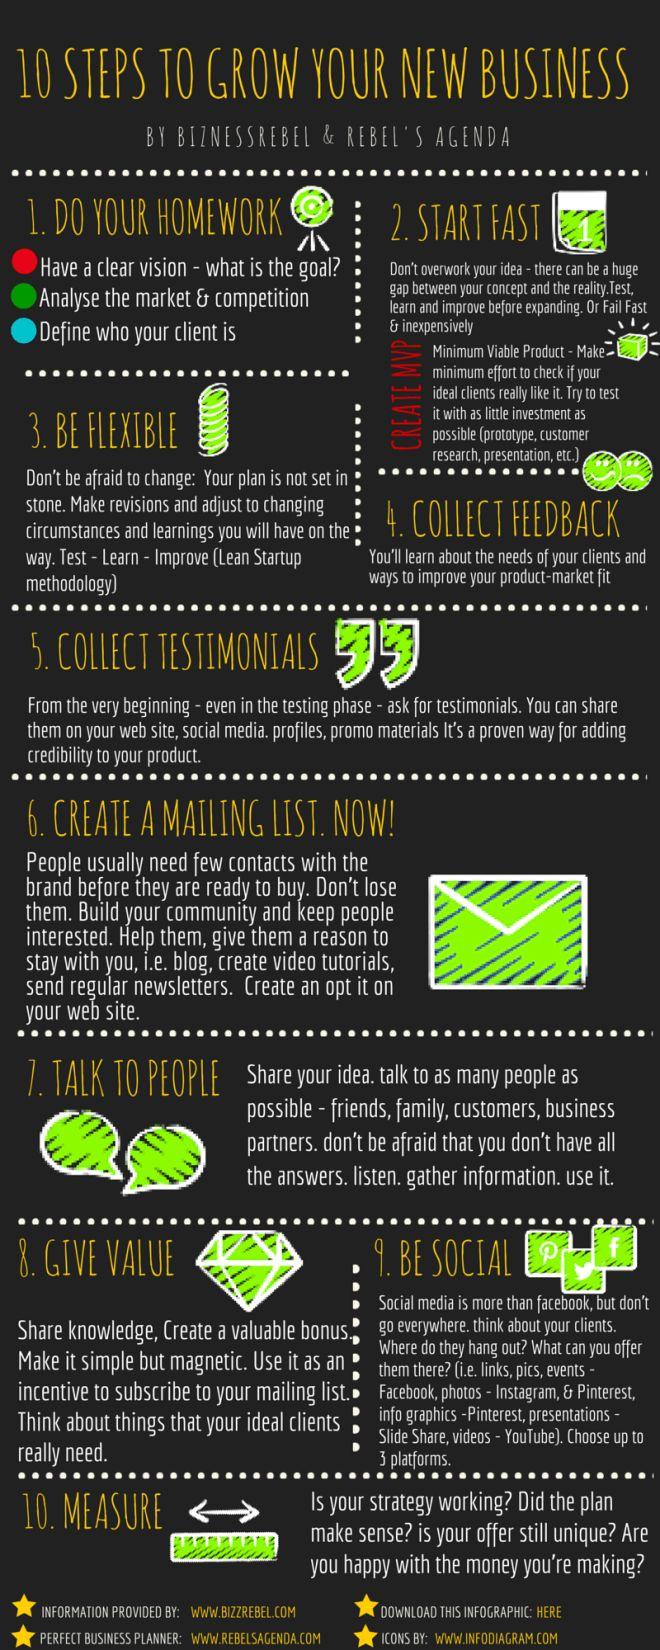 Rebels Agenda_10 steps to grow your bizness